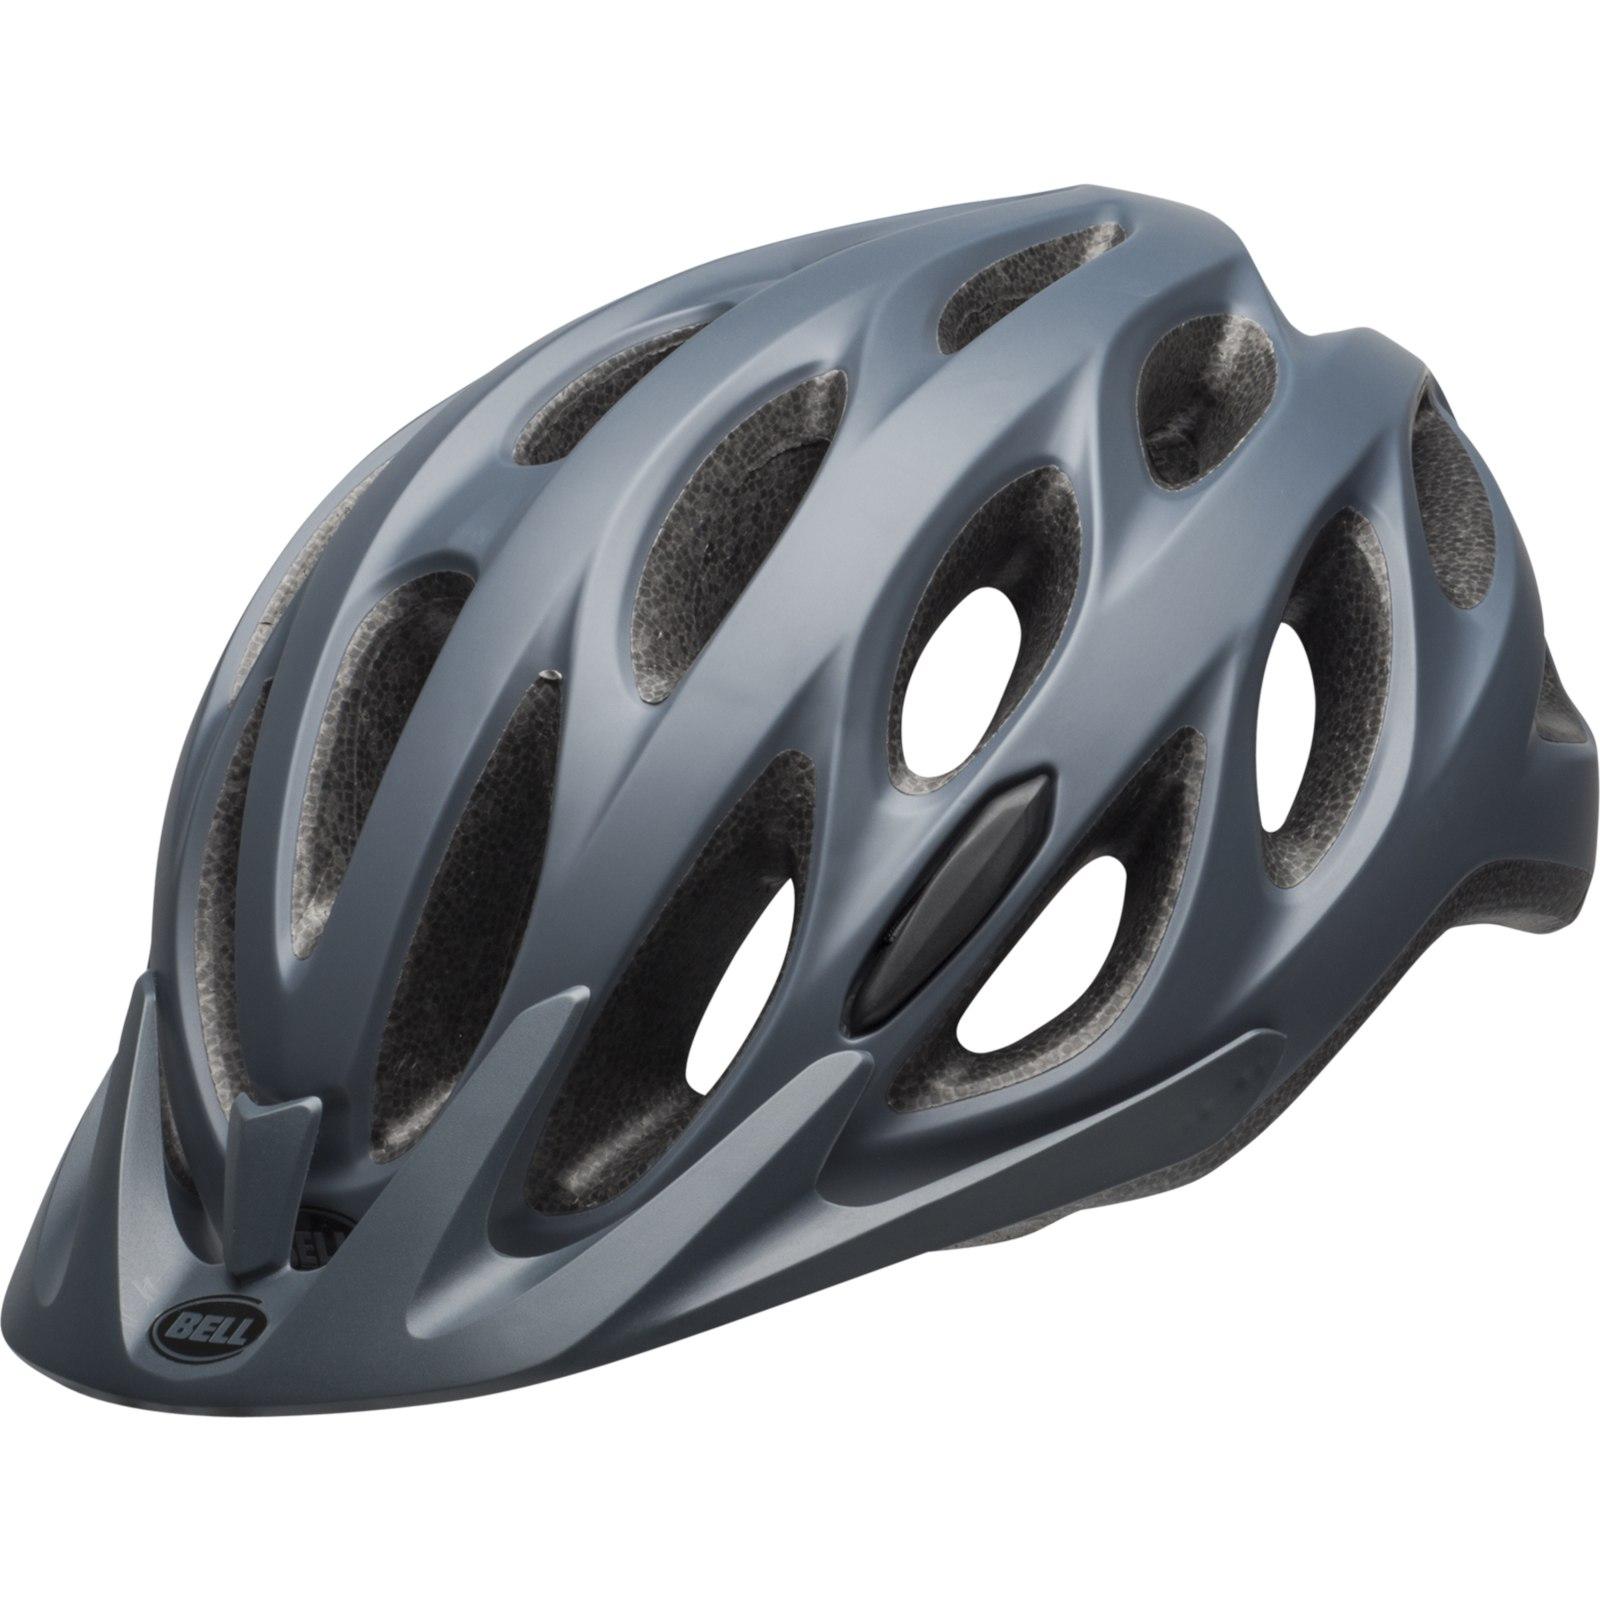 Bell Tracker Helmet UA (54-61 cm) - matte lead